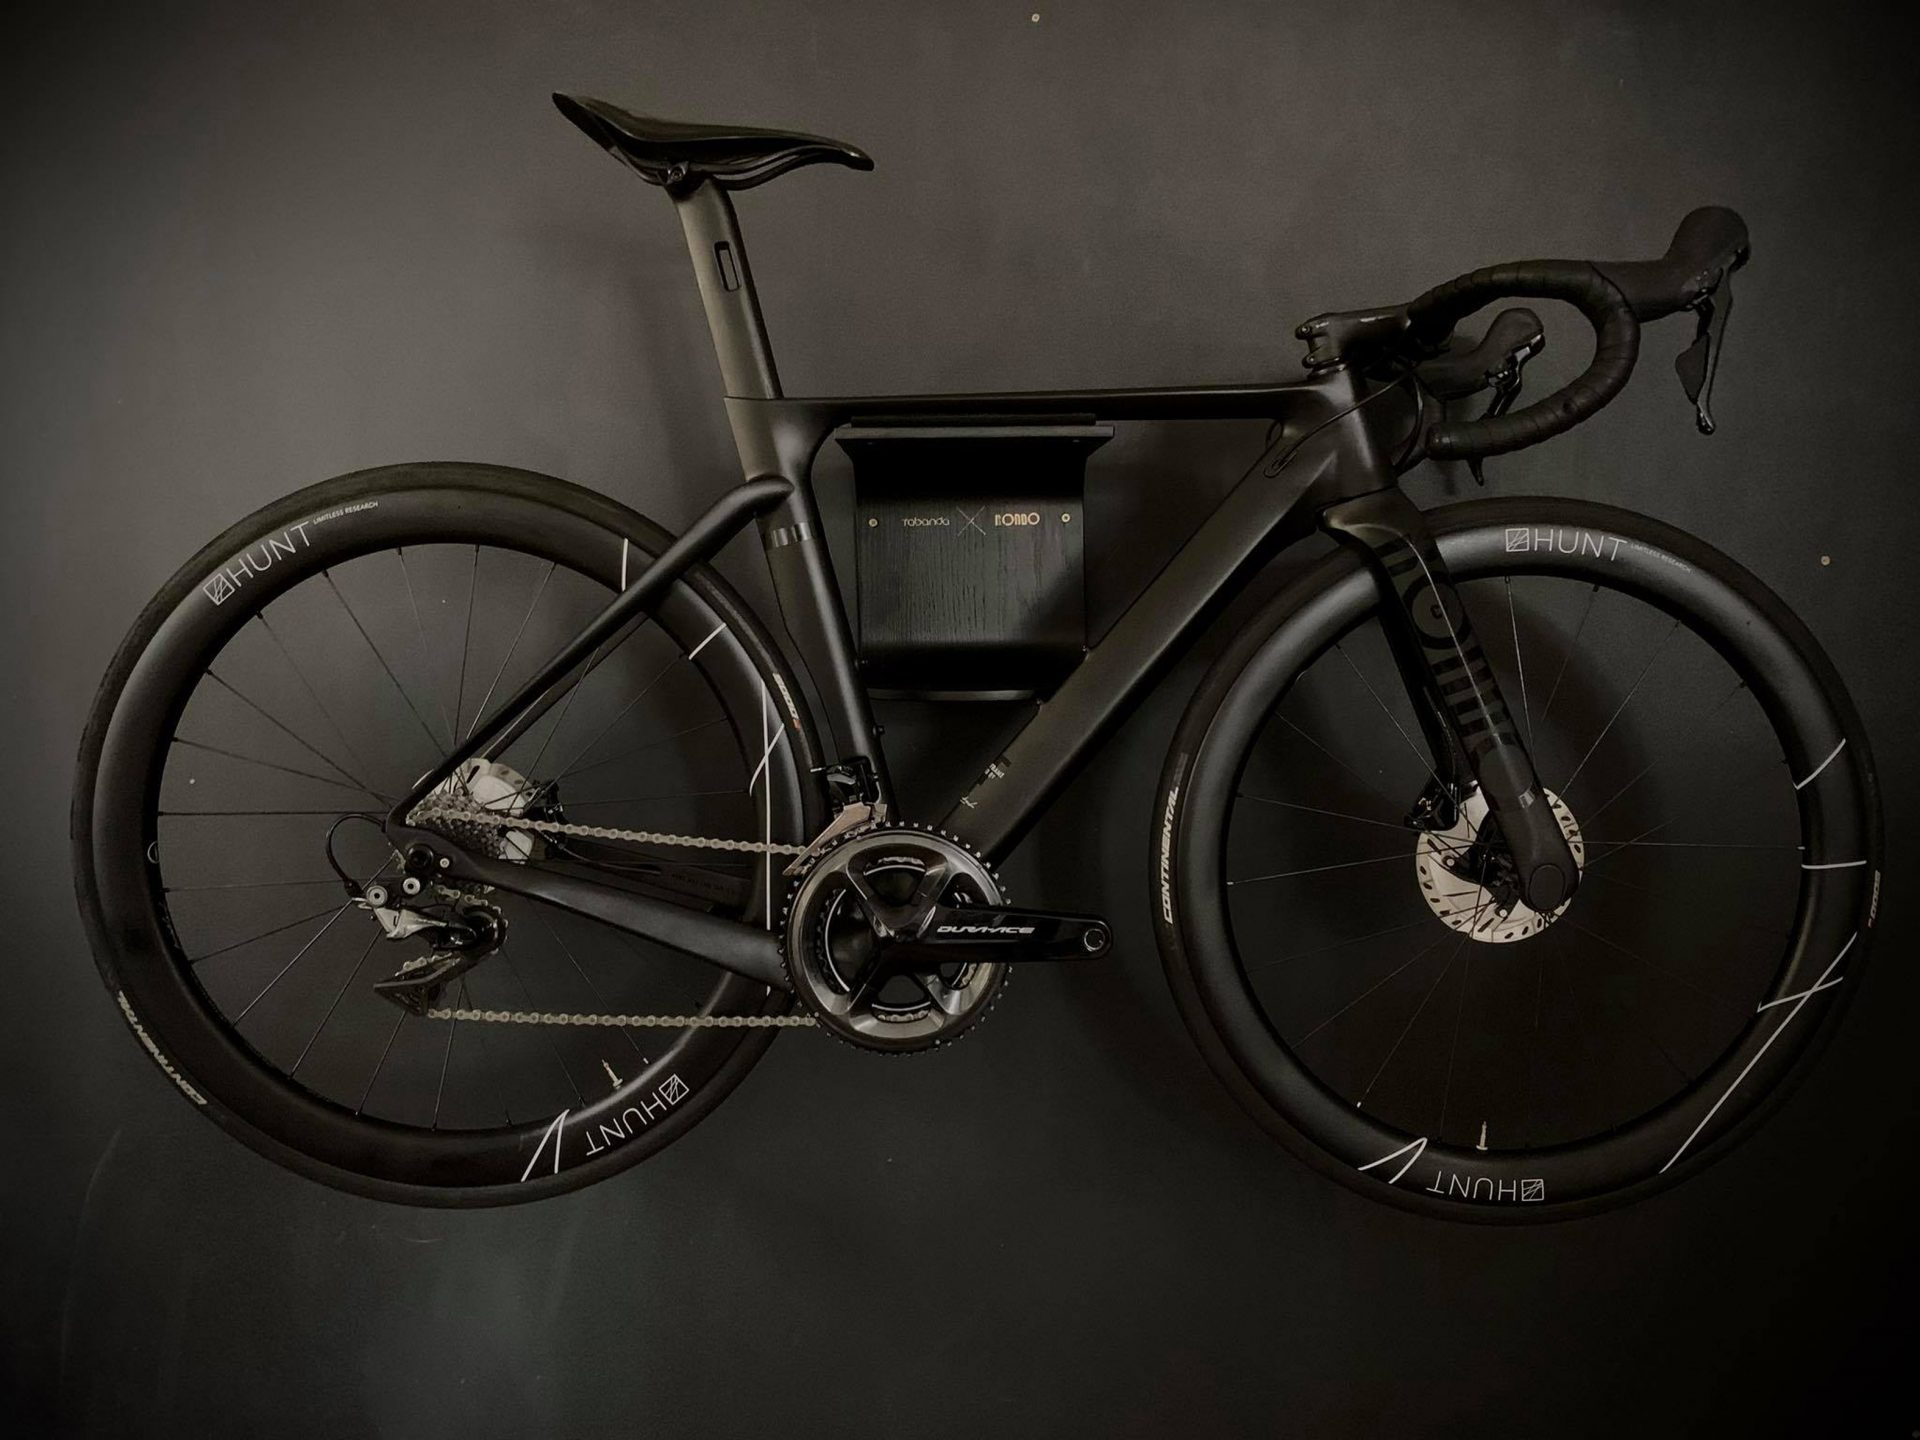 u-shape-black-wieszak-rowerowy-poroducent-tabanda-projektant-filip-ludka-tomasz-kempa-megi-malinowska-tabanda_designalive